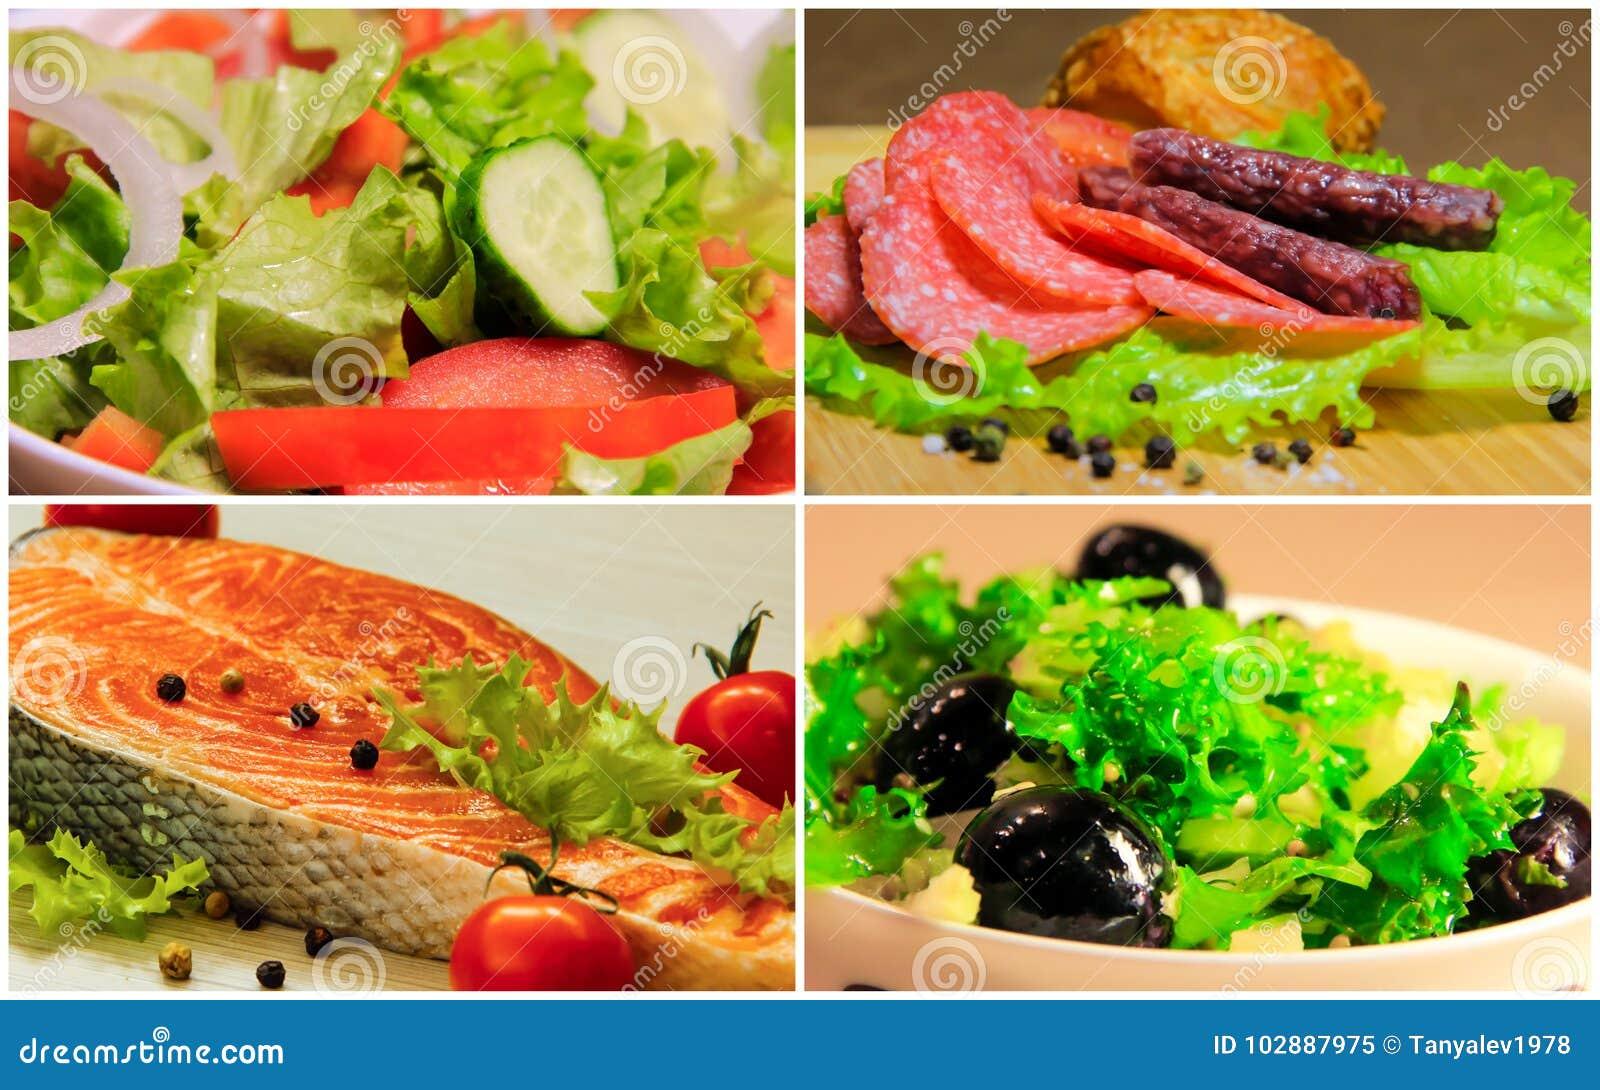 Collage salad food fish